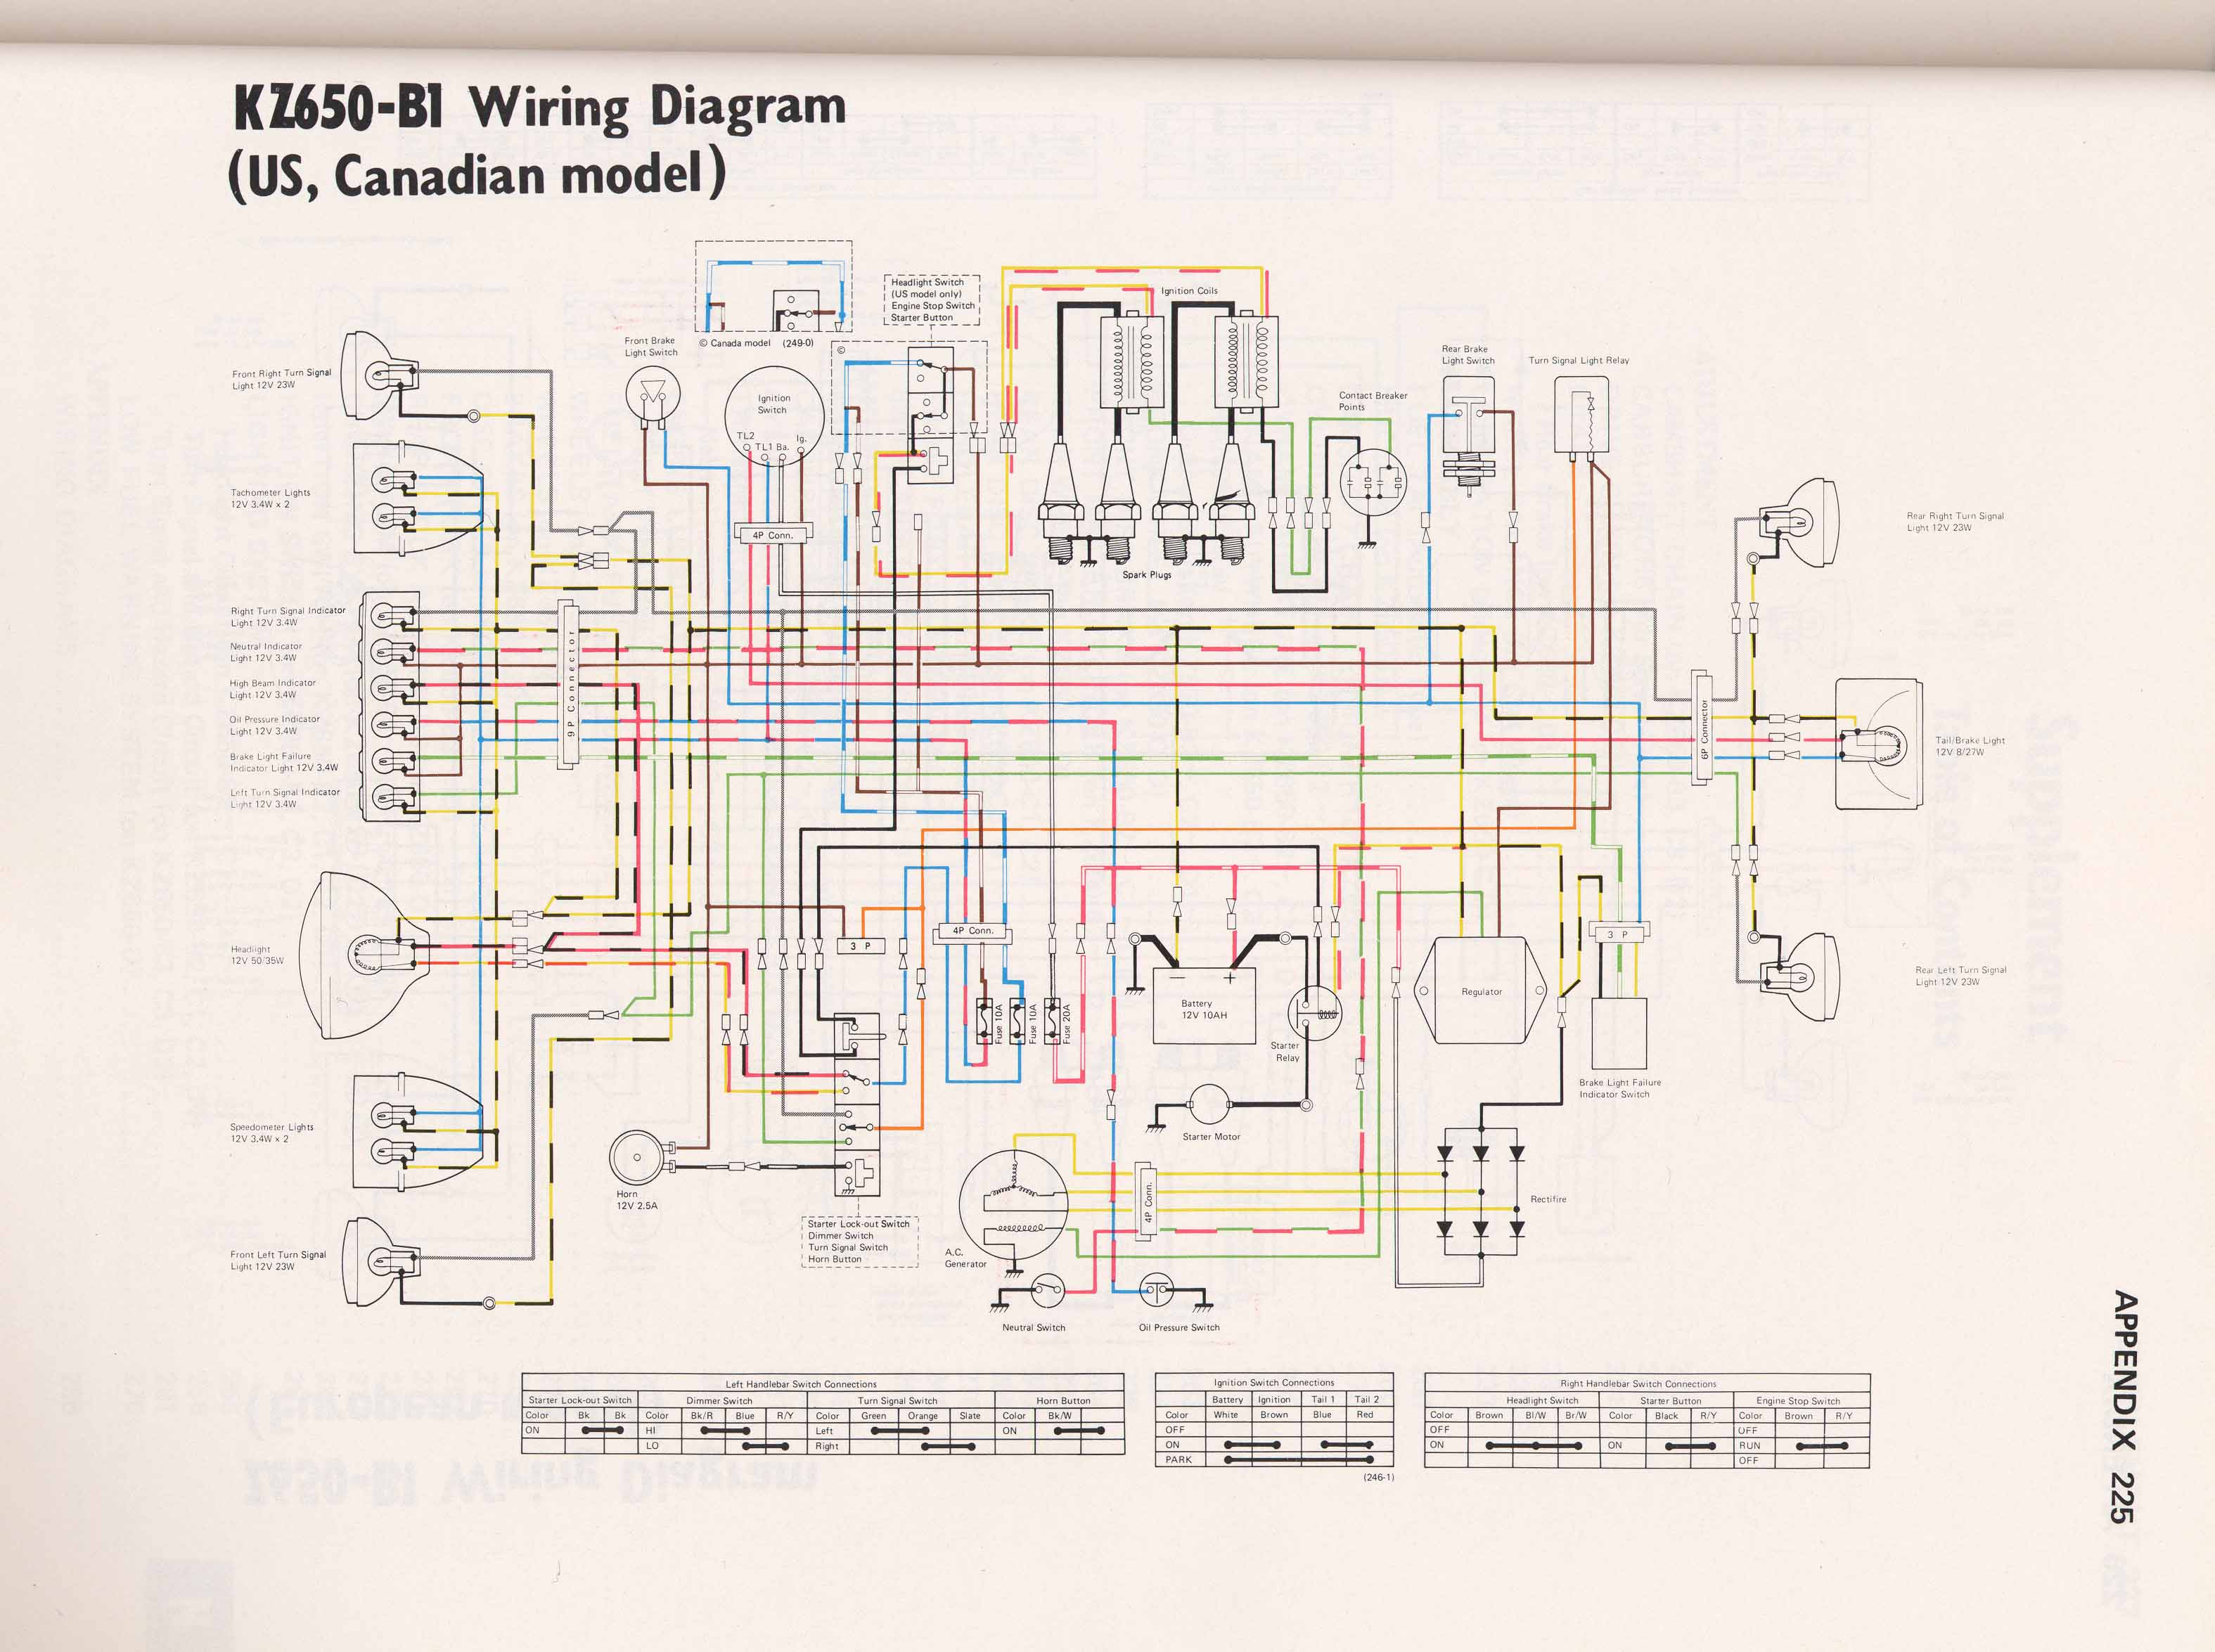 1982 Kawasaki Wiring Diagrams - Wiring Diagram Data on